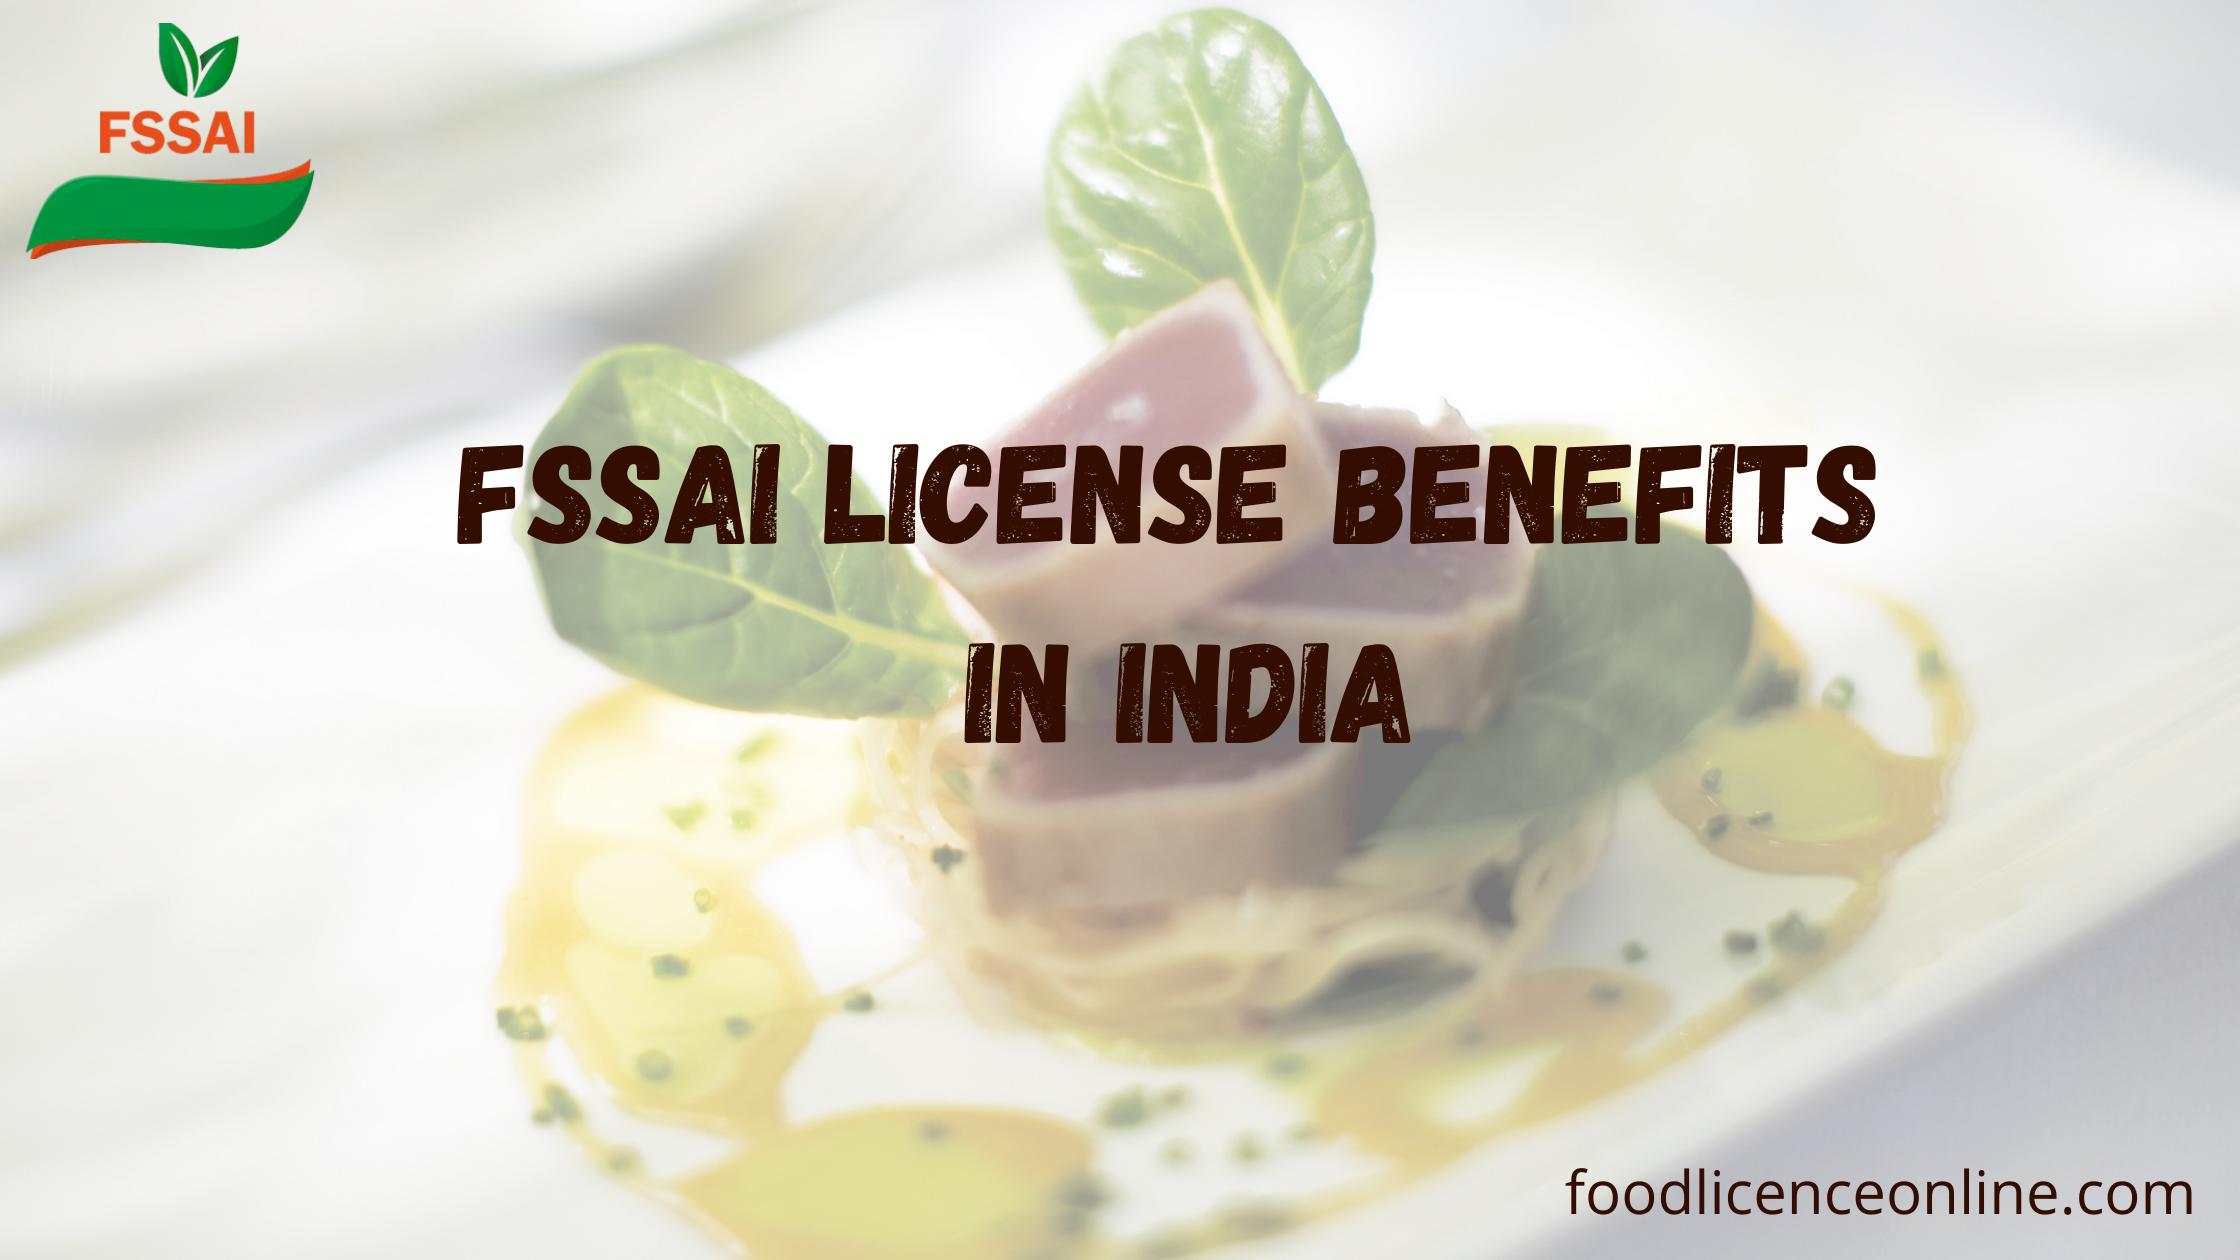 FSSAI Registration For Food Business Operator